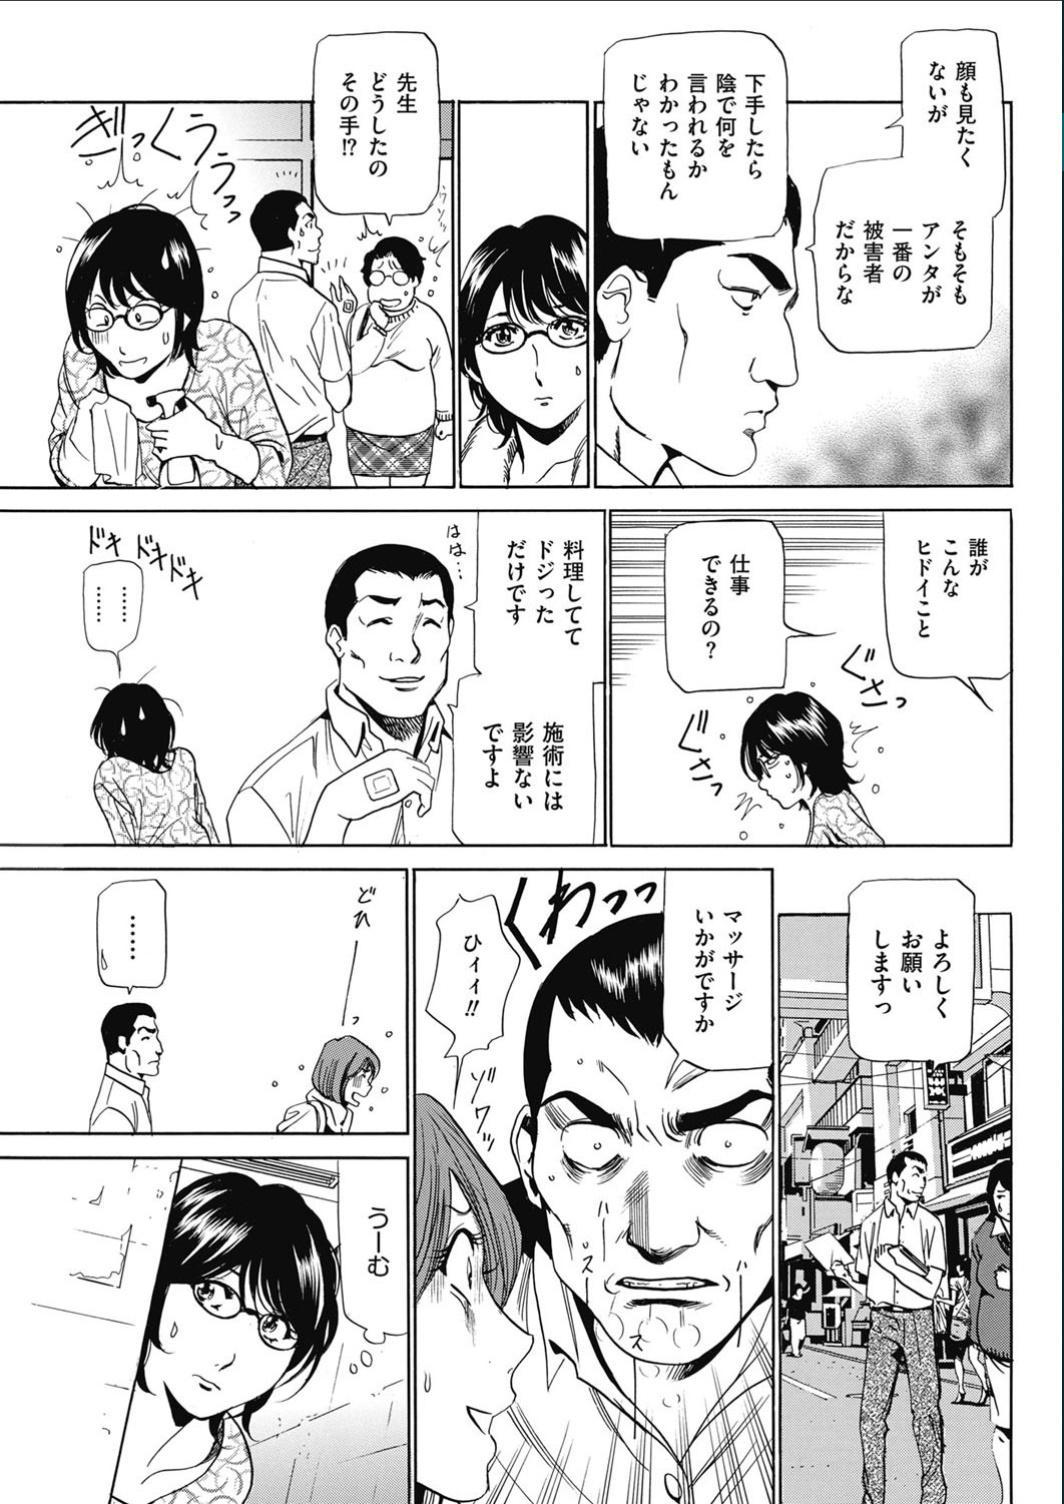 Wa Usuki Ipa a 1-10 97